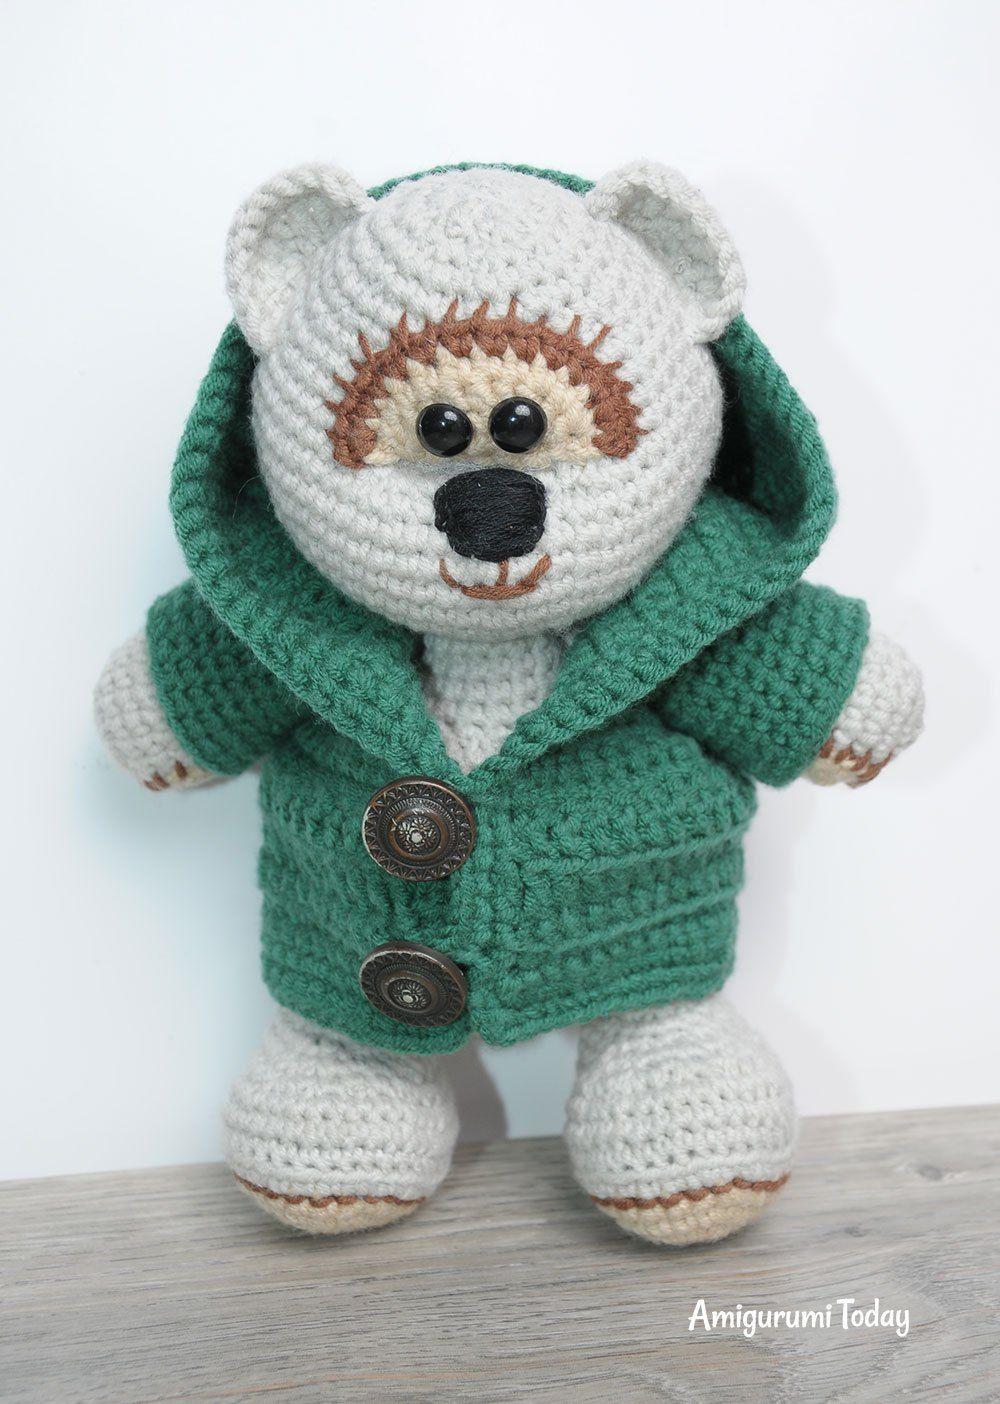 Honey teddy bear crochet pattern crocheting pinterest teddy honey teddy bear crochet pattern bankloansurffo Choice Image